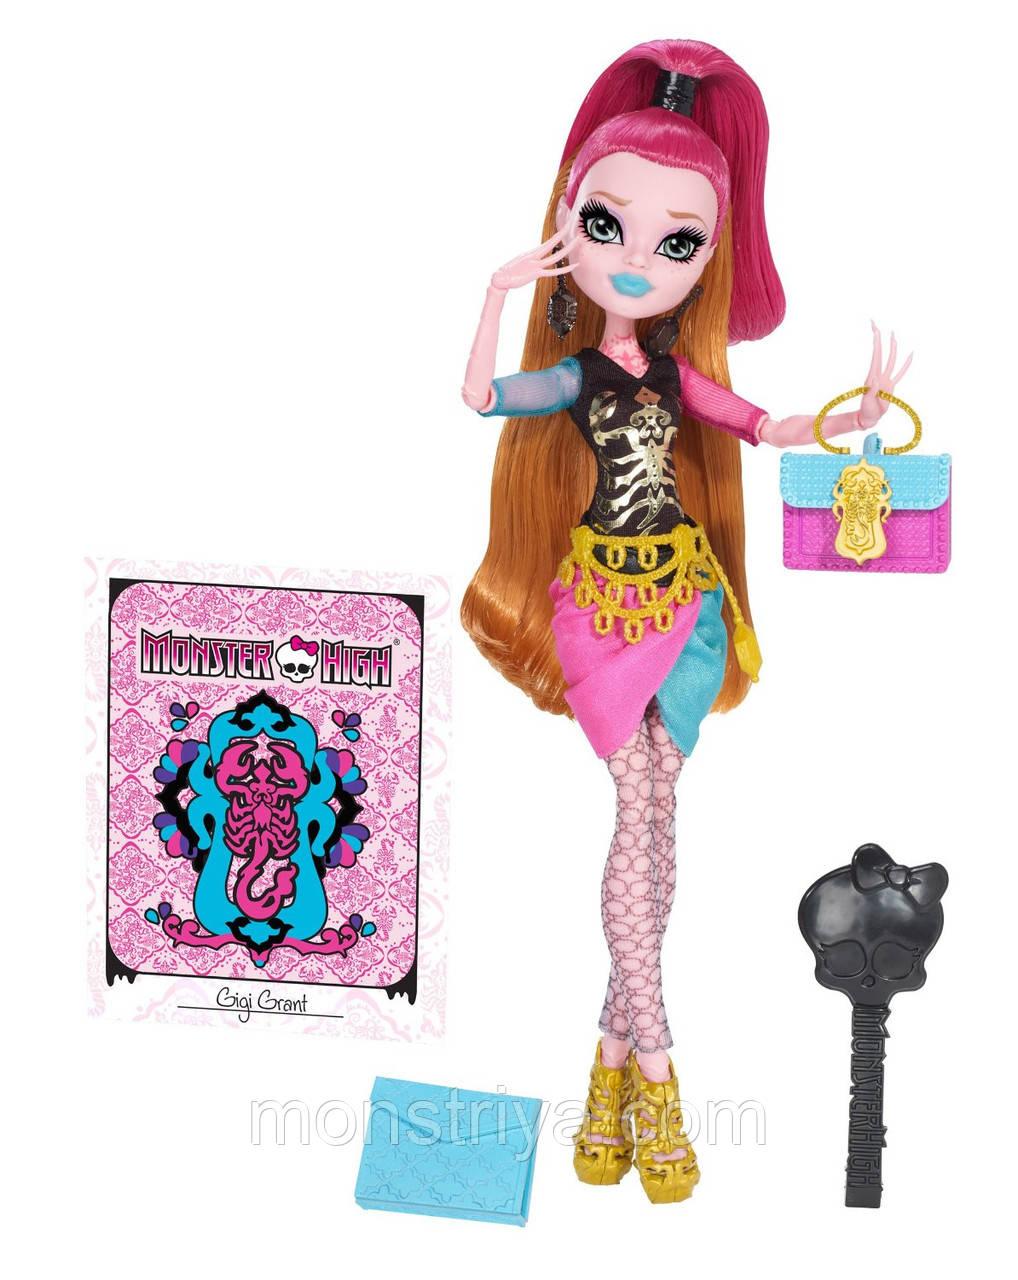 Кукла Монстер Хай Джиджи Грант Новый Скарместер Monster High New Scaremester Gigi Grant Doll